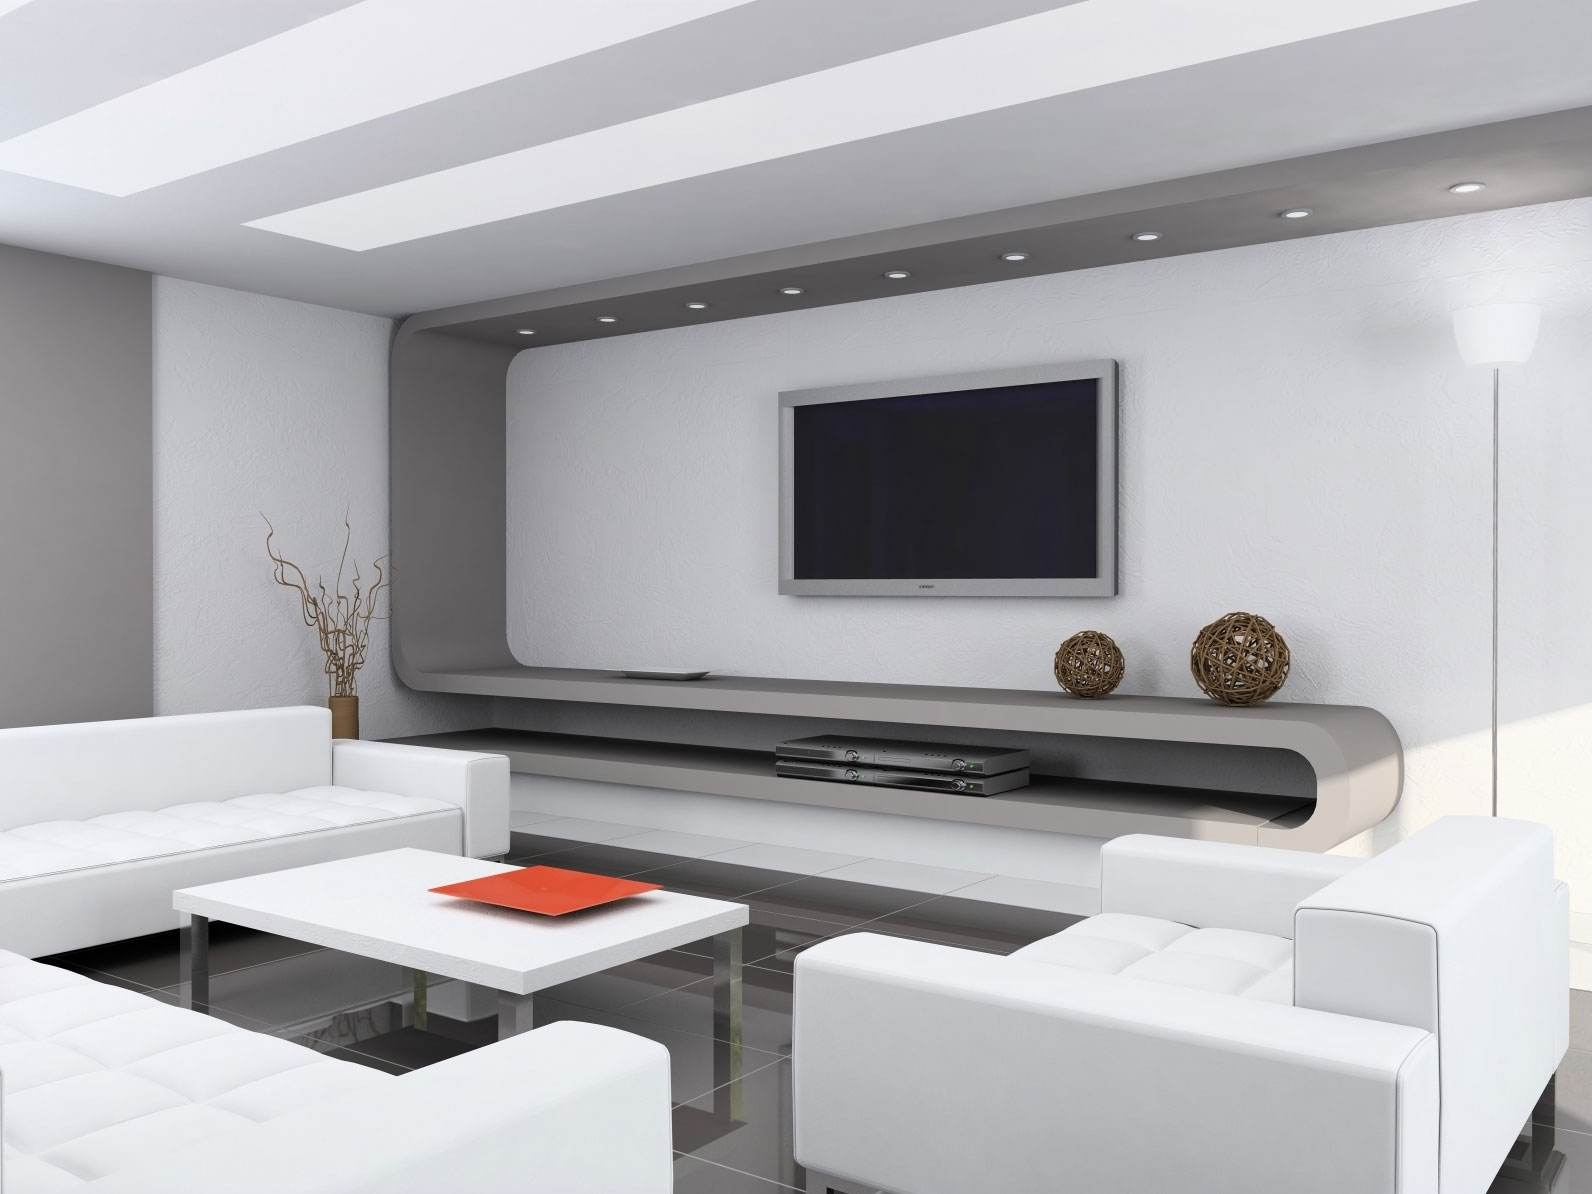 1592x1194px 7 Amazing Interior Modern Design Ideas Picture in Interior Design